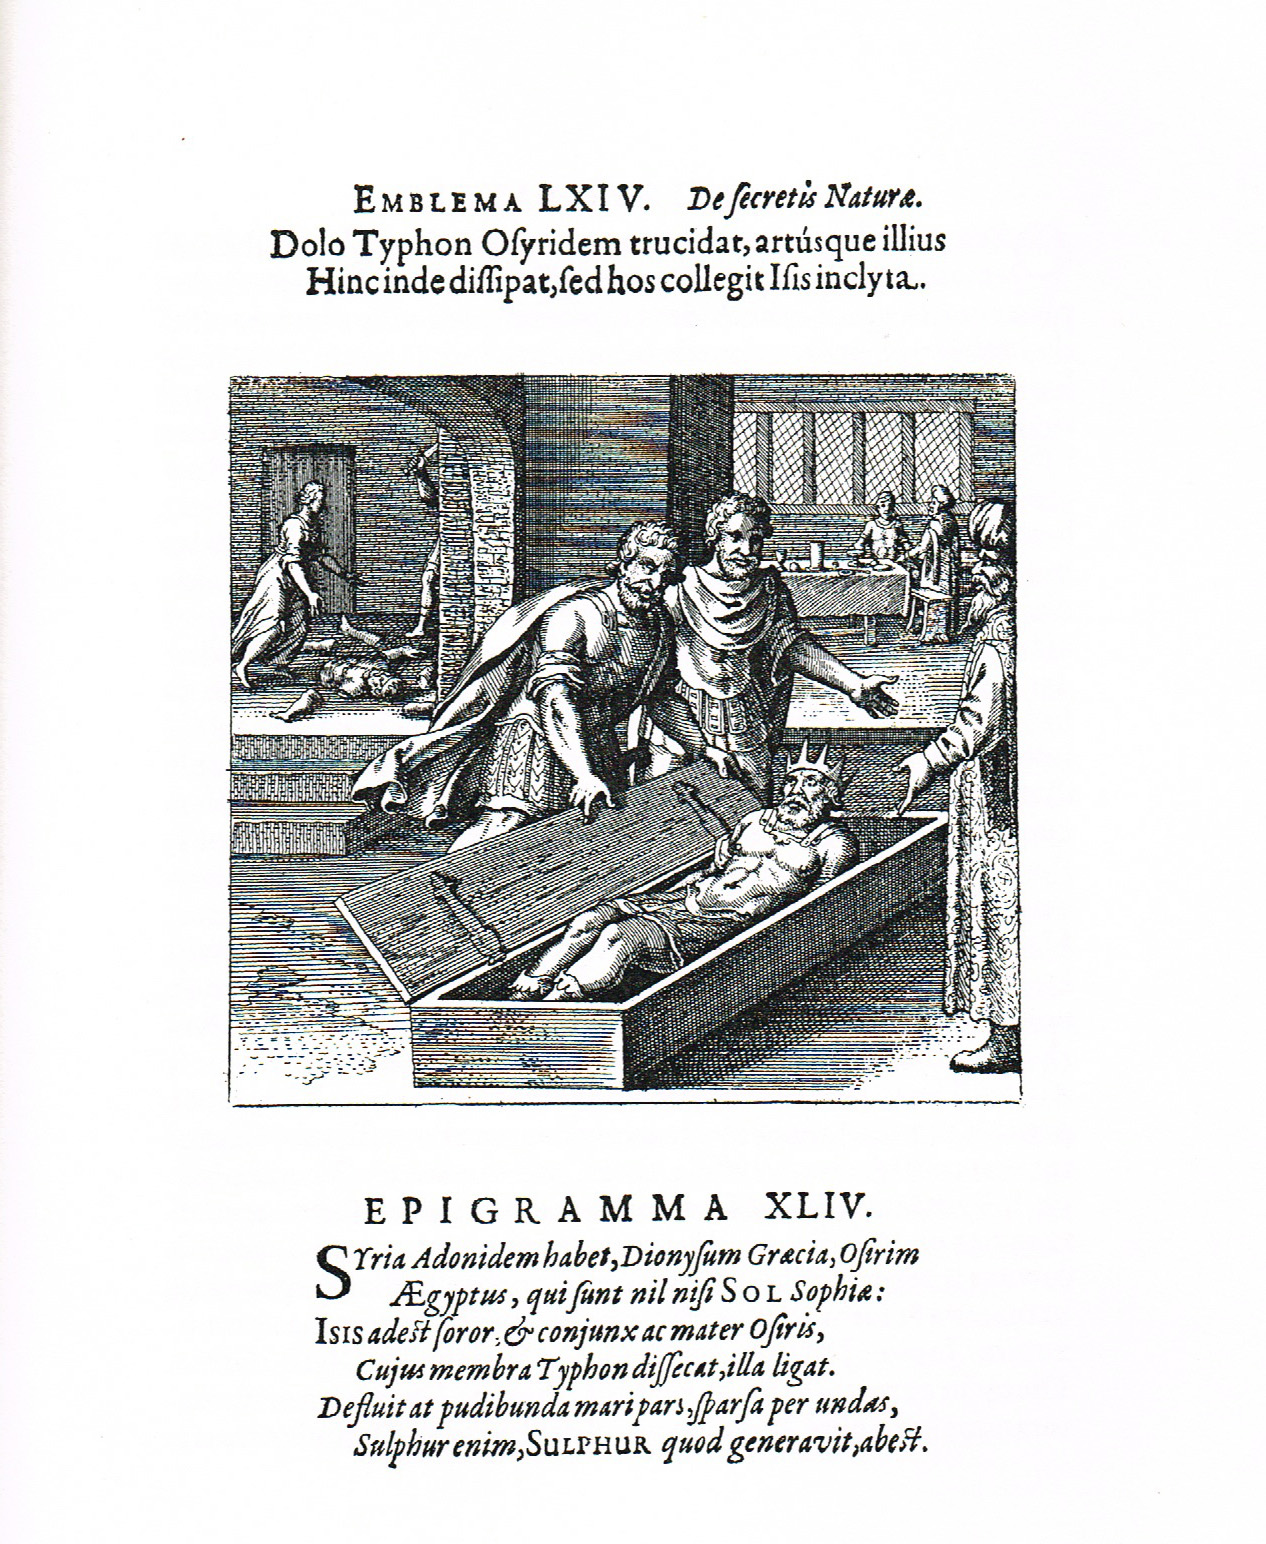 from Michael Maier, 'Atalanta Fugiens' (1618), facsimile by fabric libri (2006)